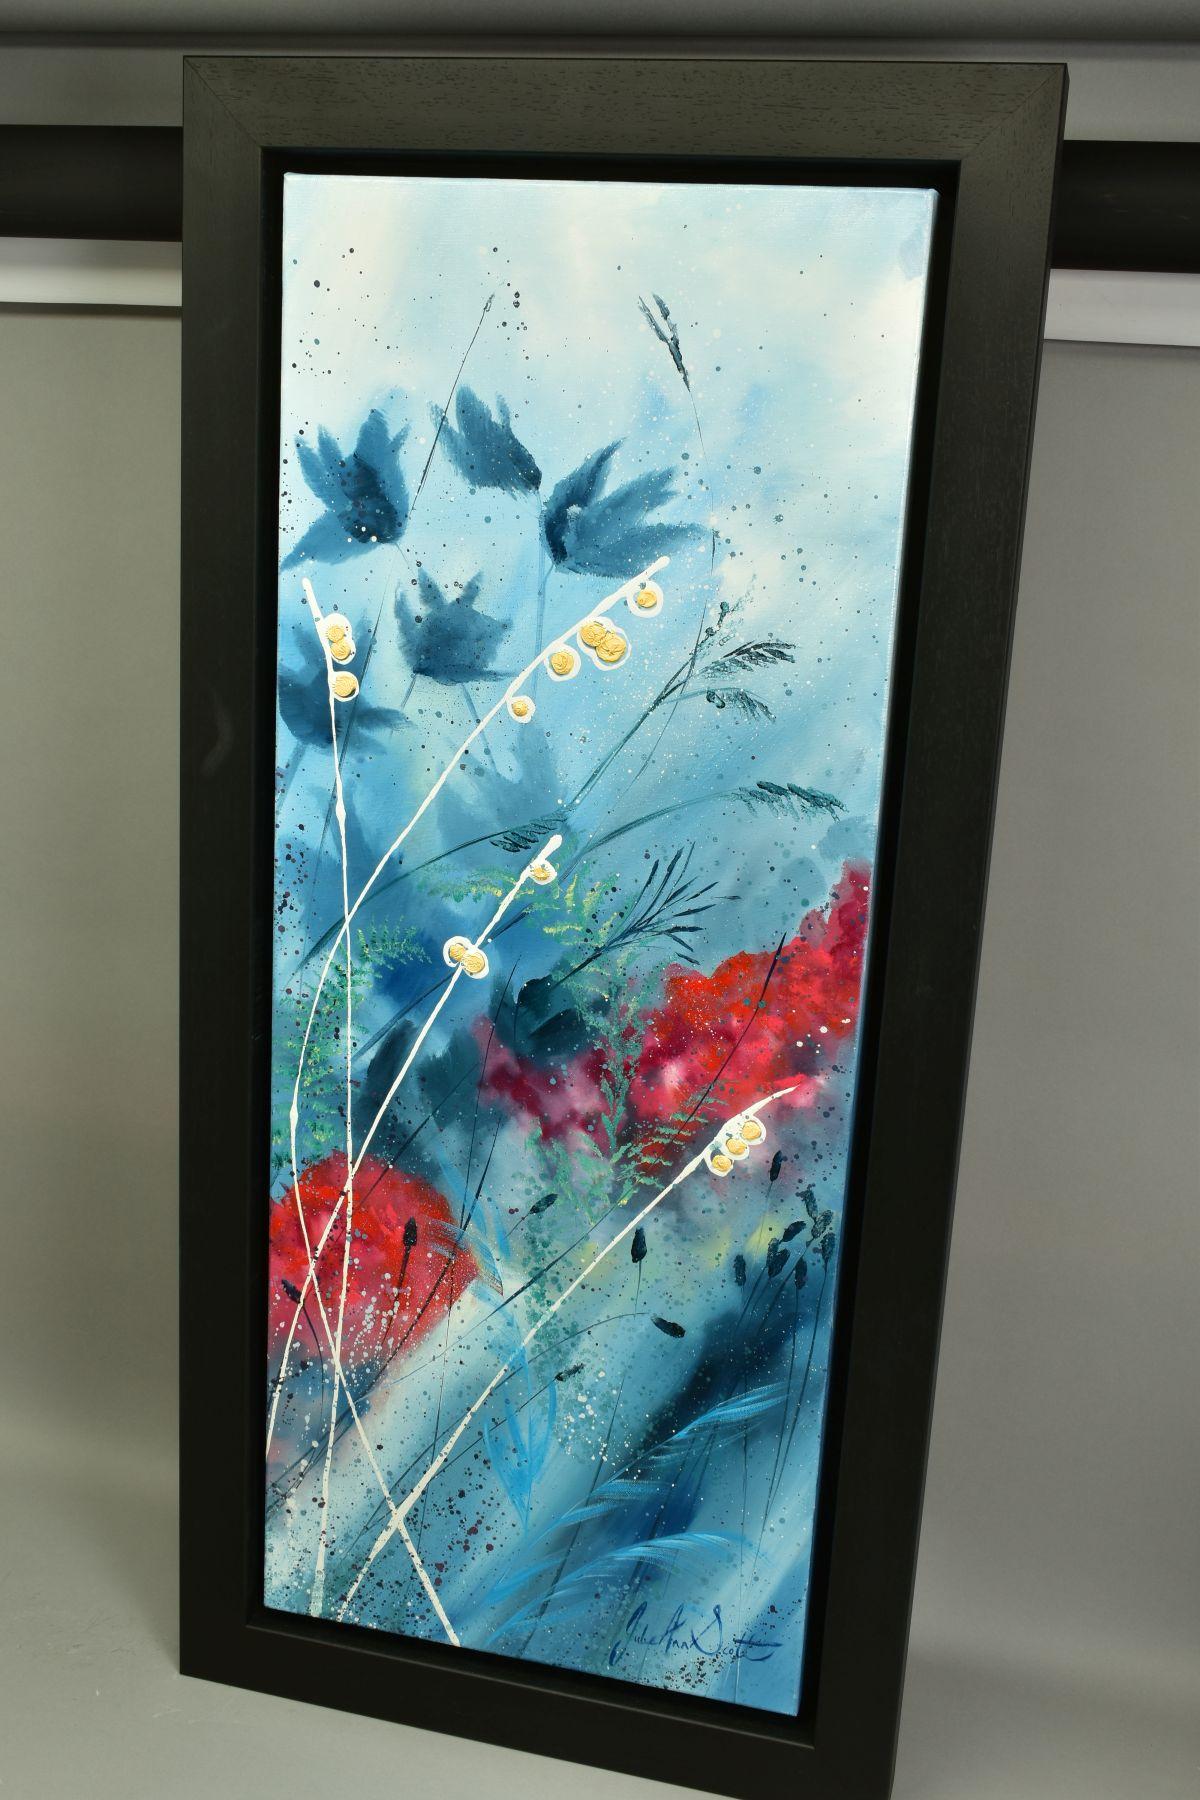 JULIE ANN SCOTT (BRITISH CONTEMPORARY), 'Home Spun Joy', wild flowers against a blue backdrop, - Image 6 of 7